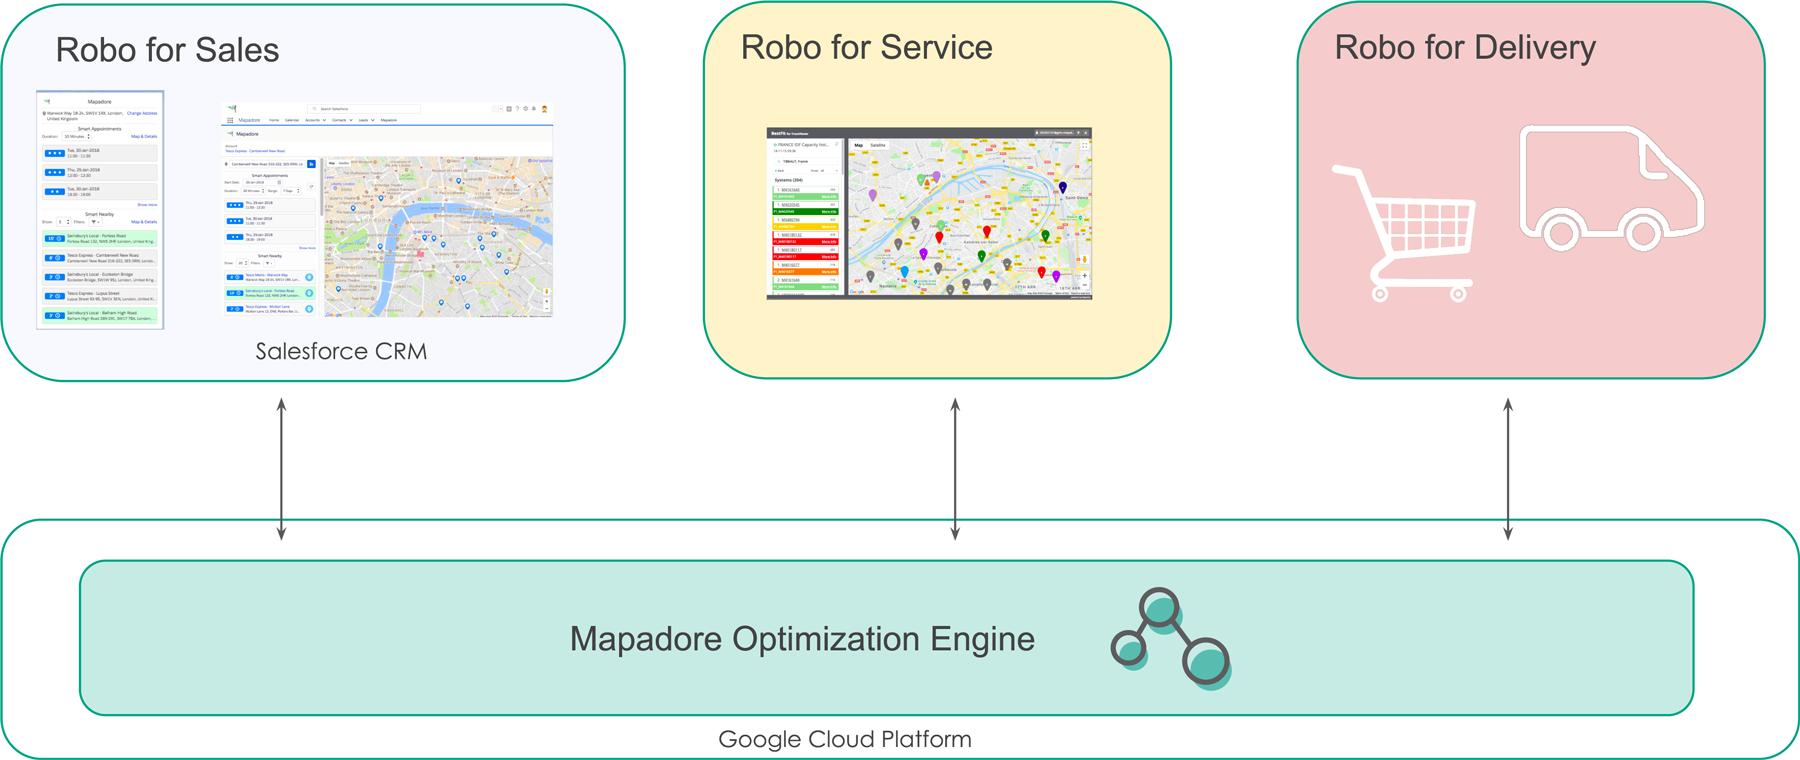 Mapadore-Robo-for-Delivery---15-Marzo-2020